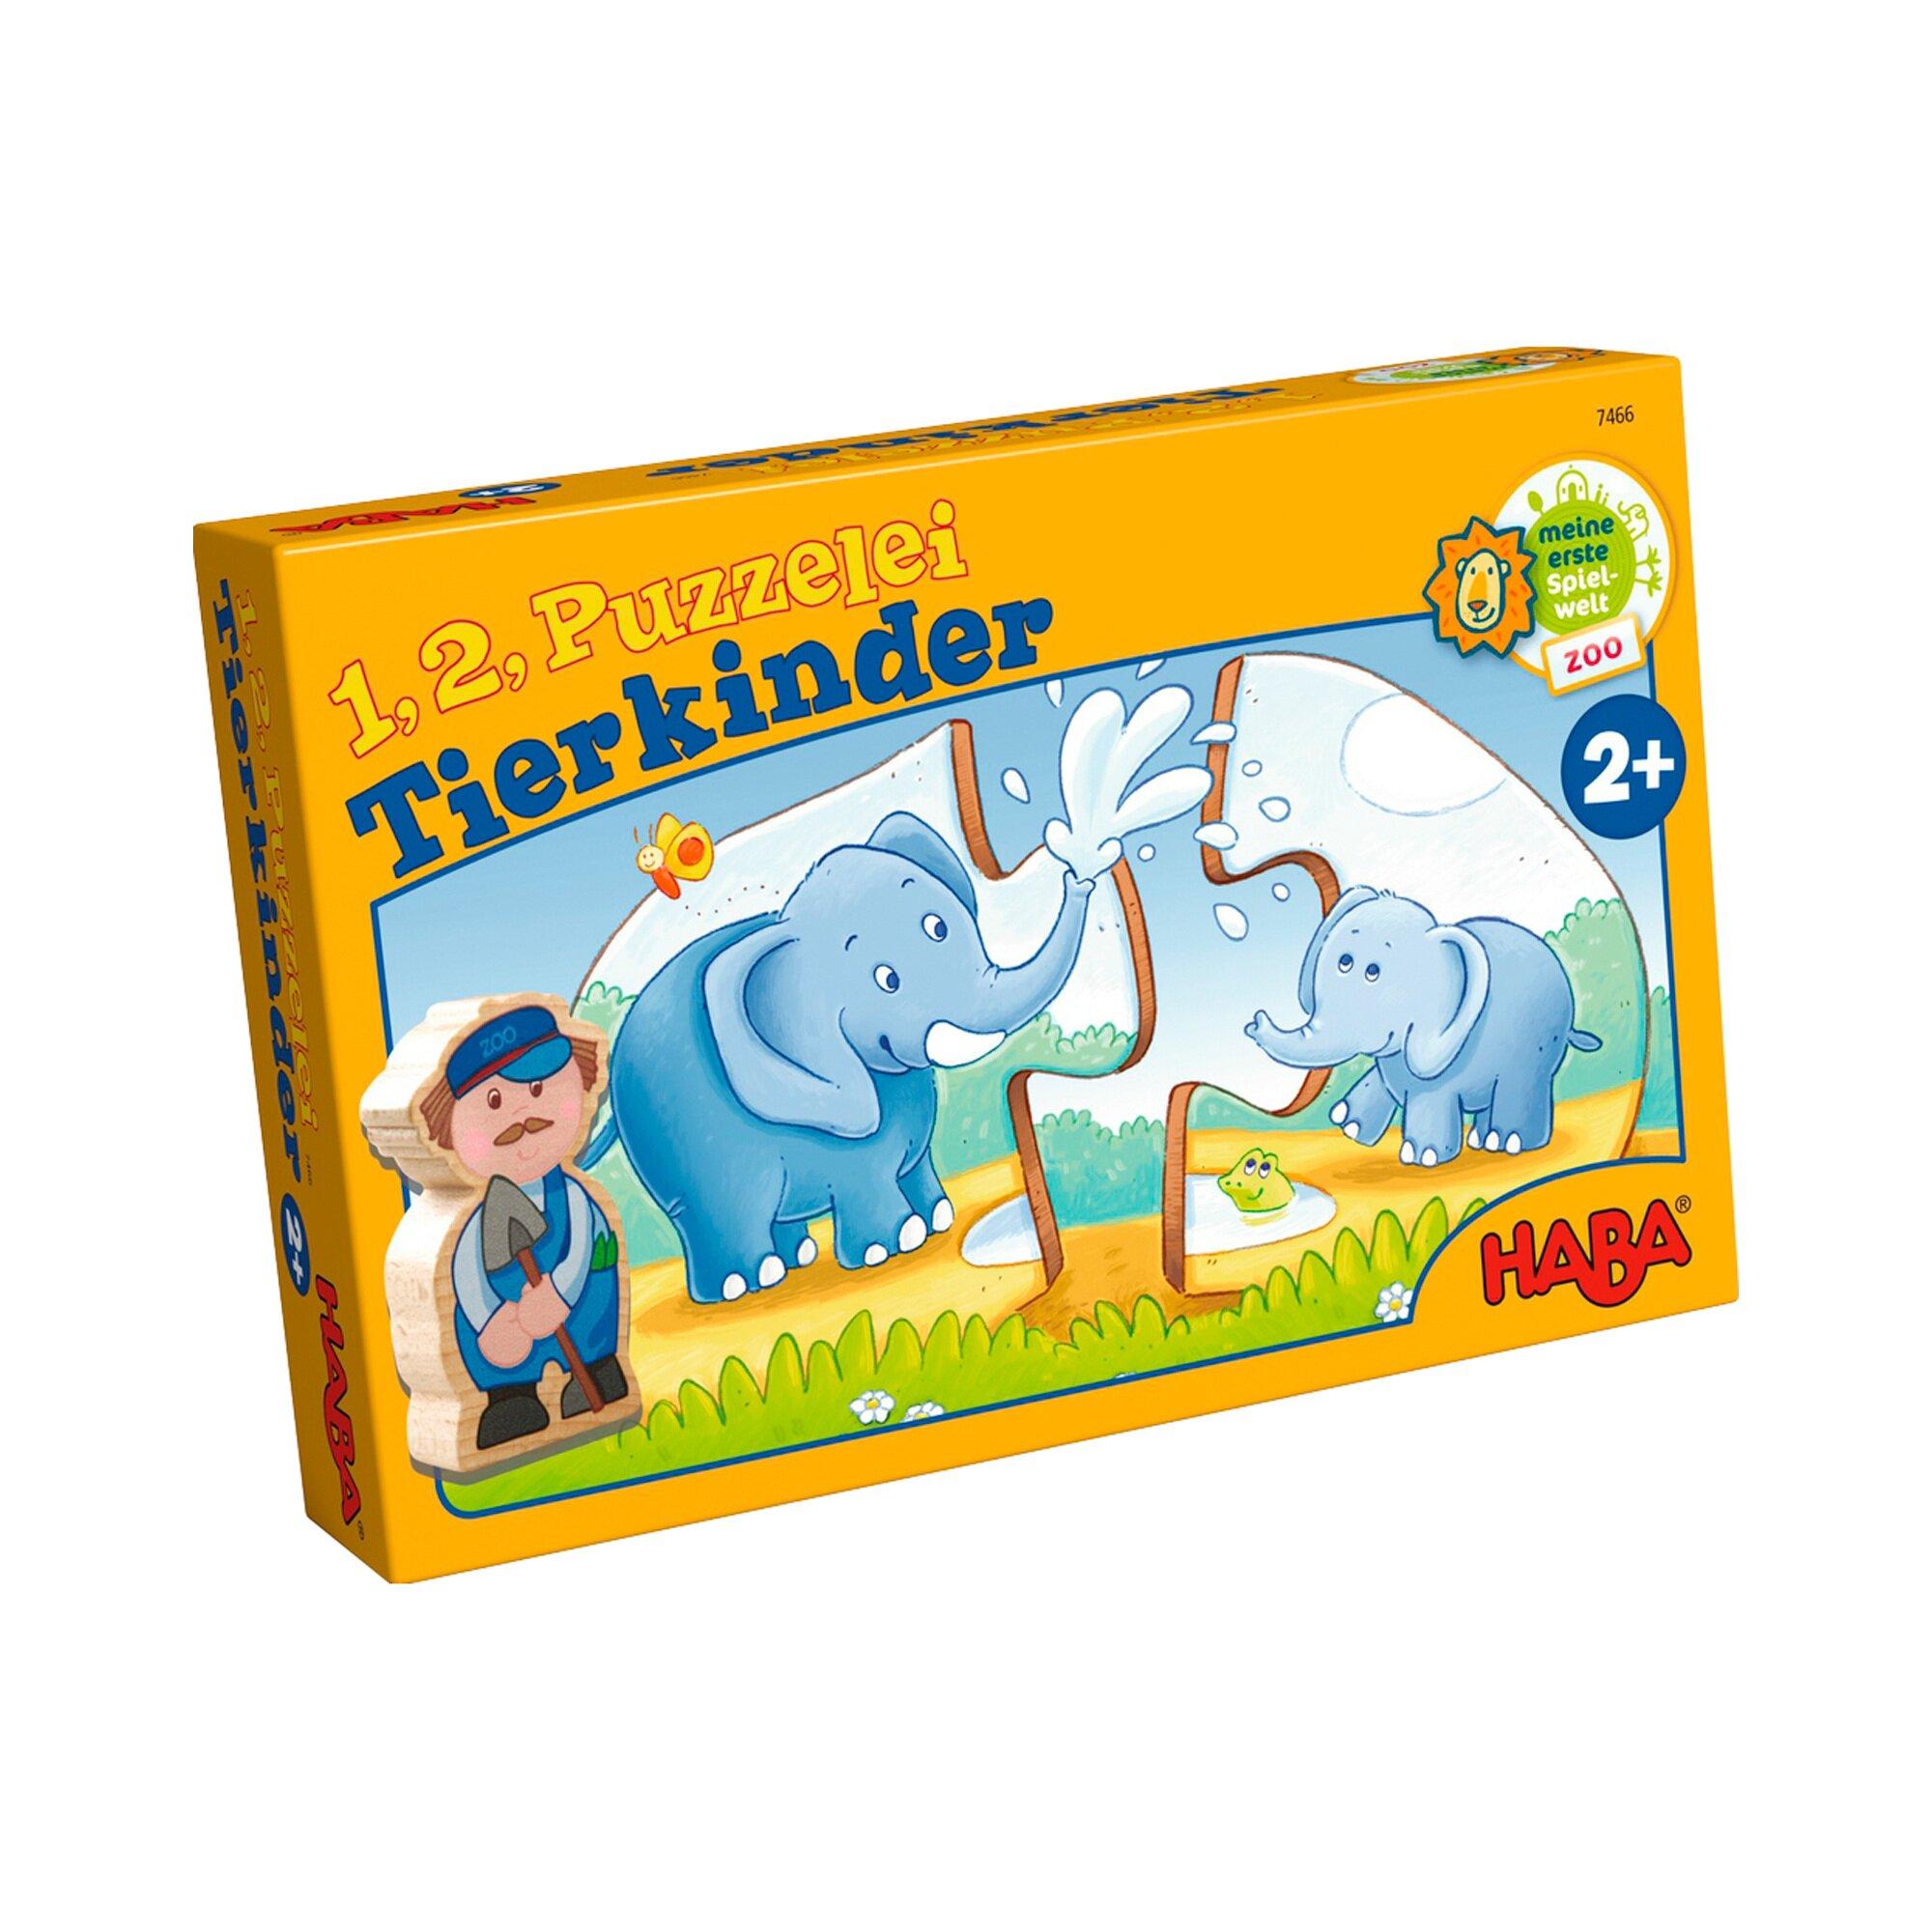 Haba Puzzle - 1, 2, Puzzelei Tierkinder